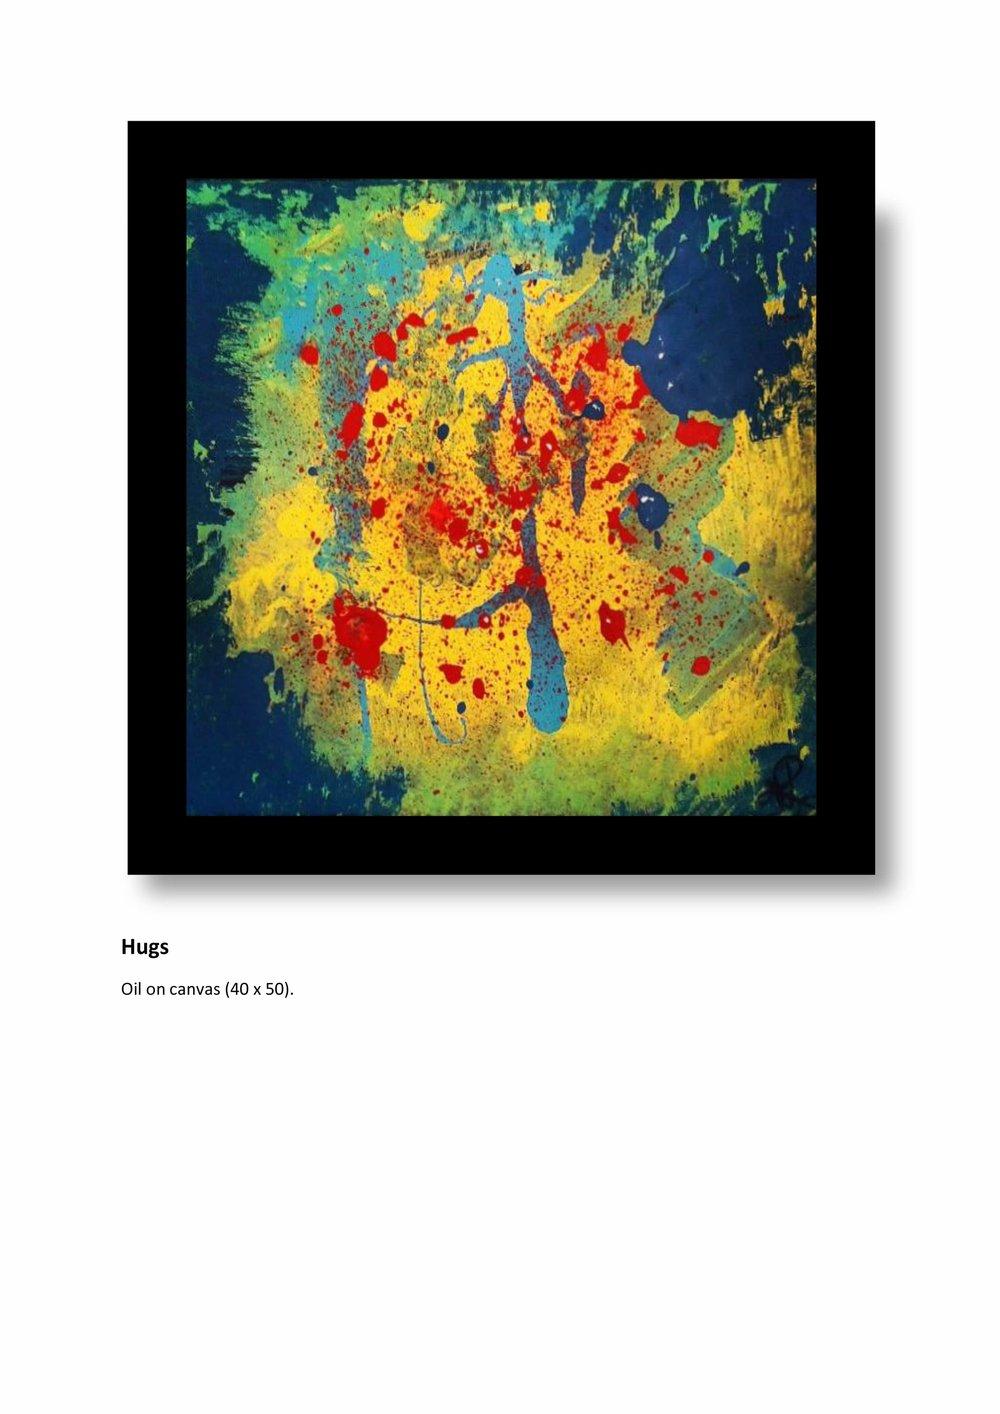 art-portfolio-aglae-corrected-25-min.jpg